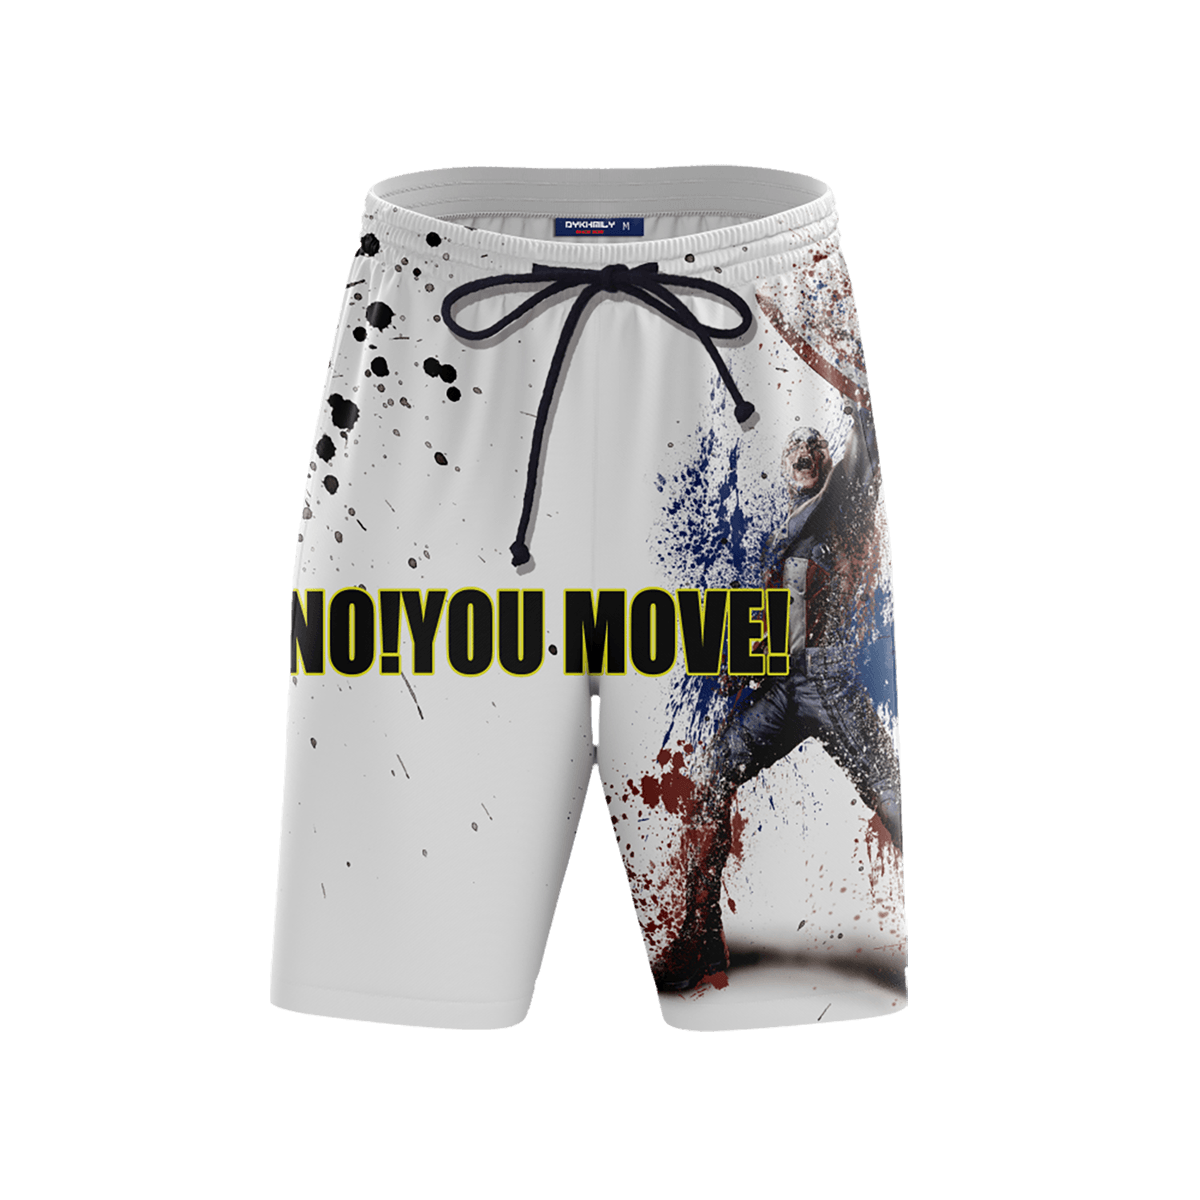 Infinity Dust Beach Shorts FDM3107 S Official Anime Swimsuit Merch